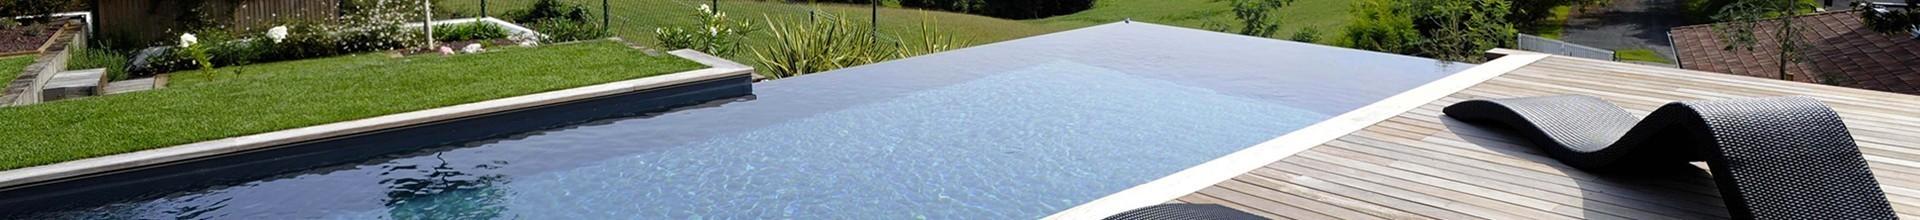 Direct usine, piscine coque prix Schaffhouse